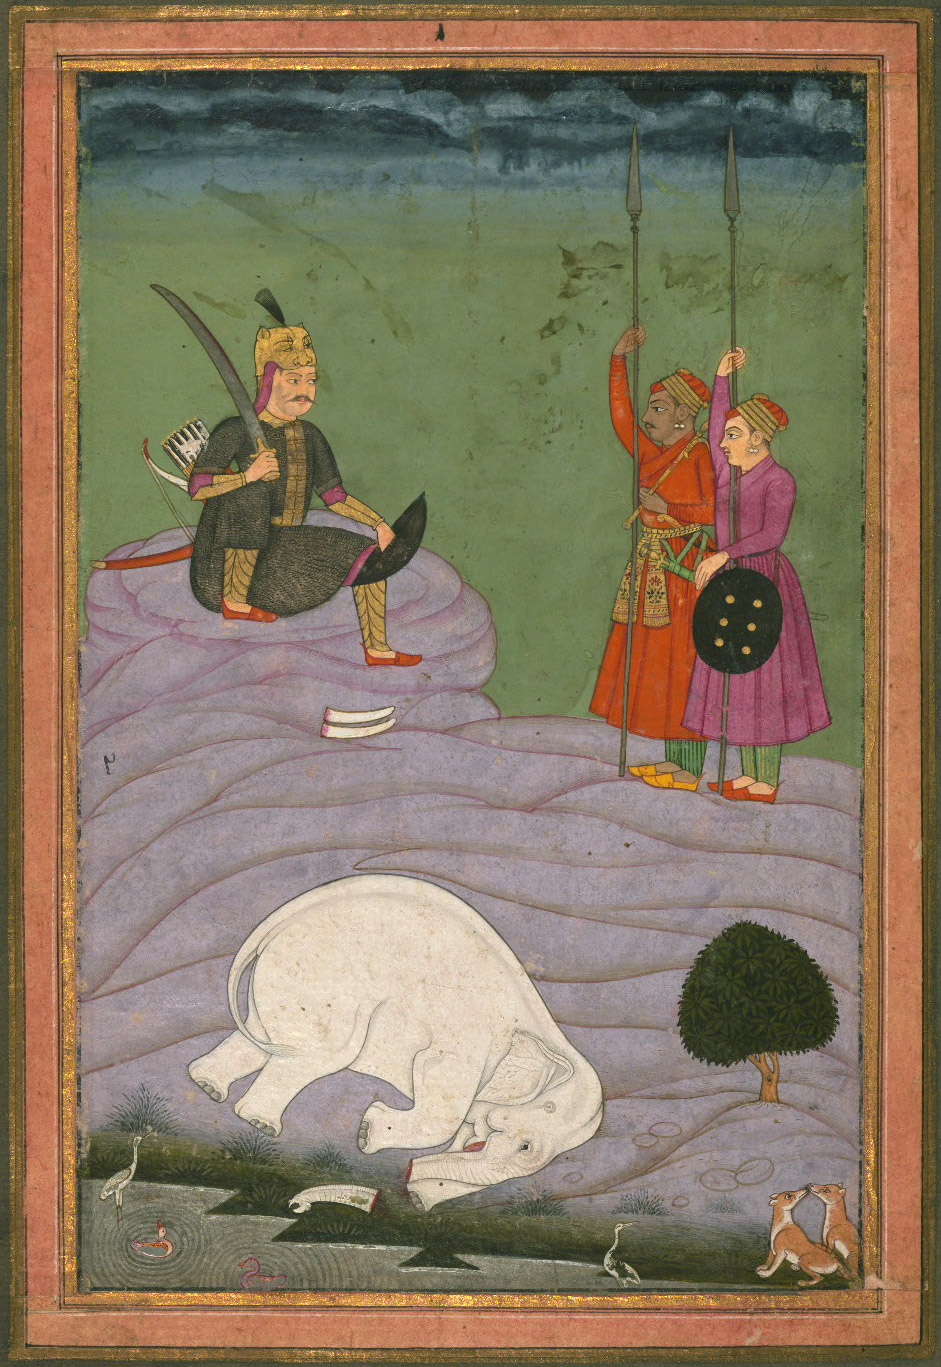 Karnata (Kanada) Ragini - Miniature Painting, Ragamala series, 19th Century